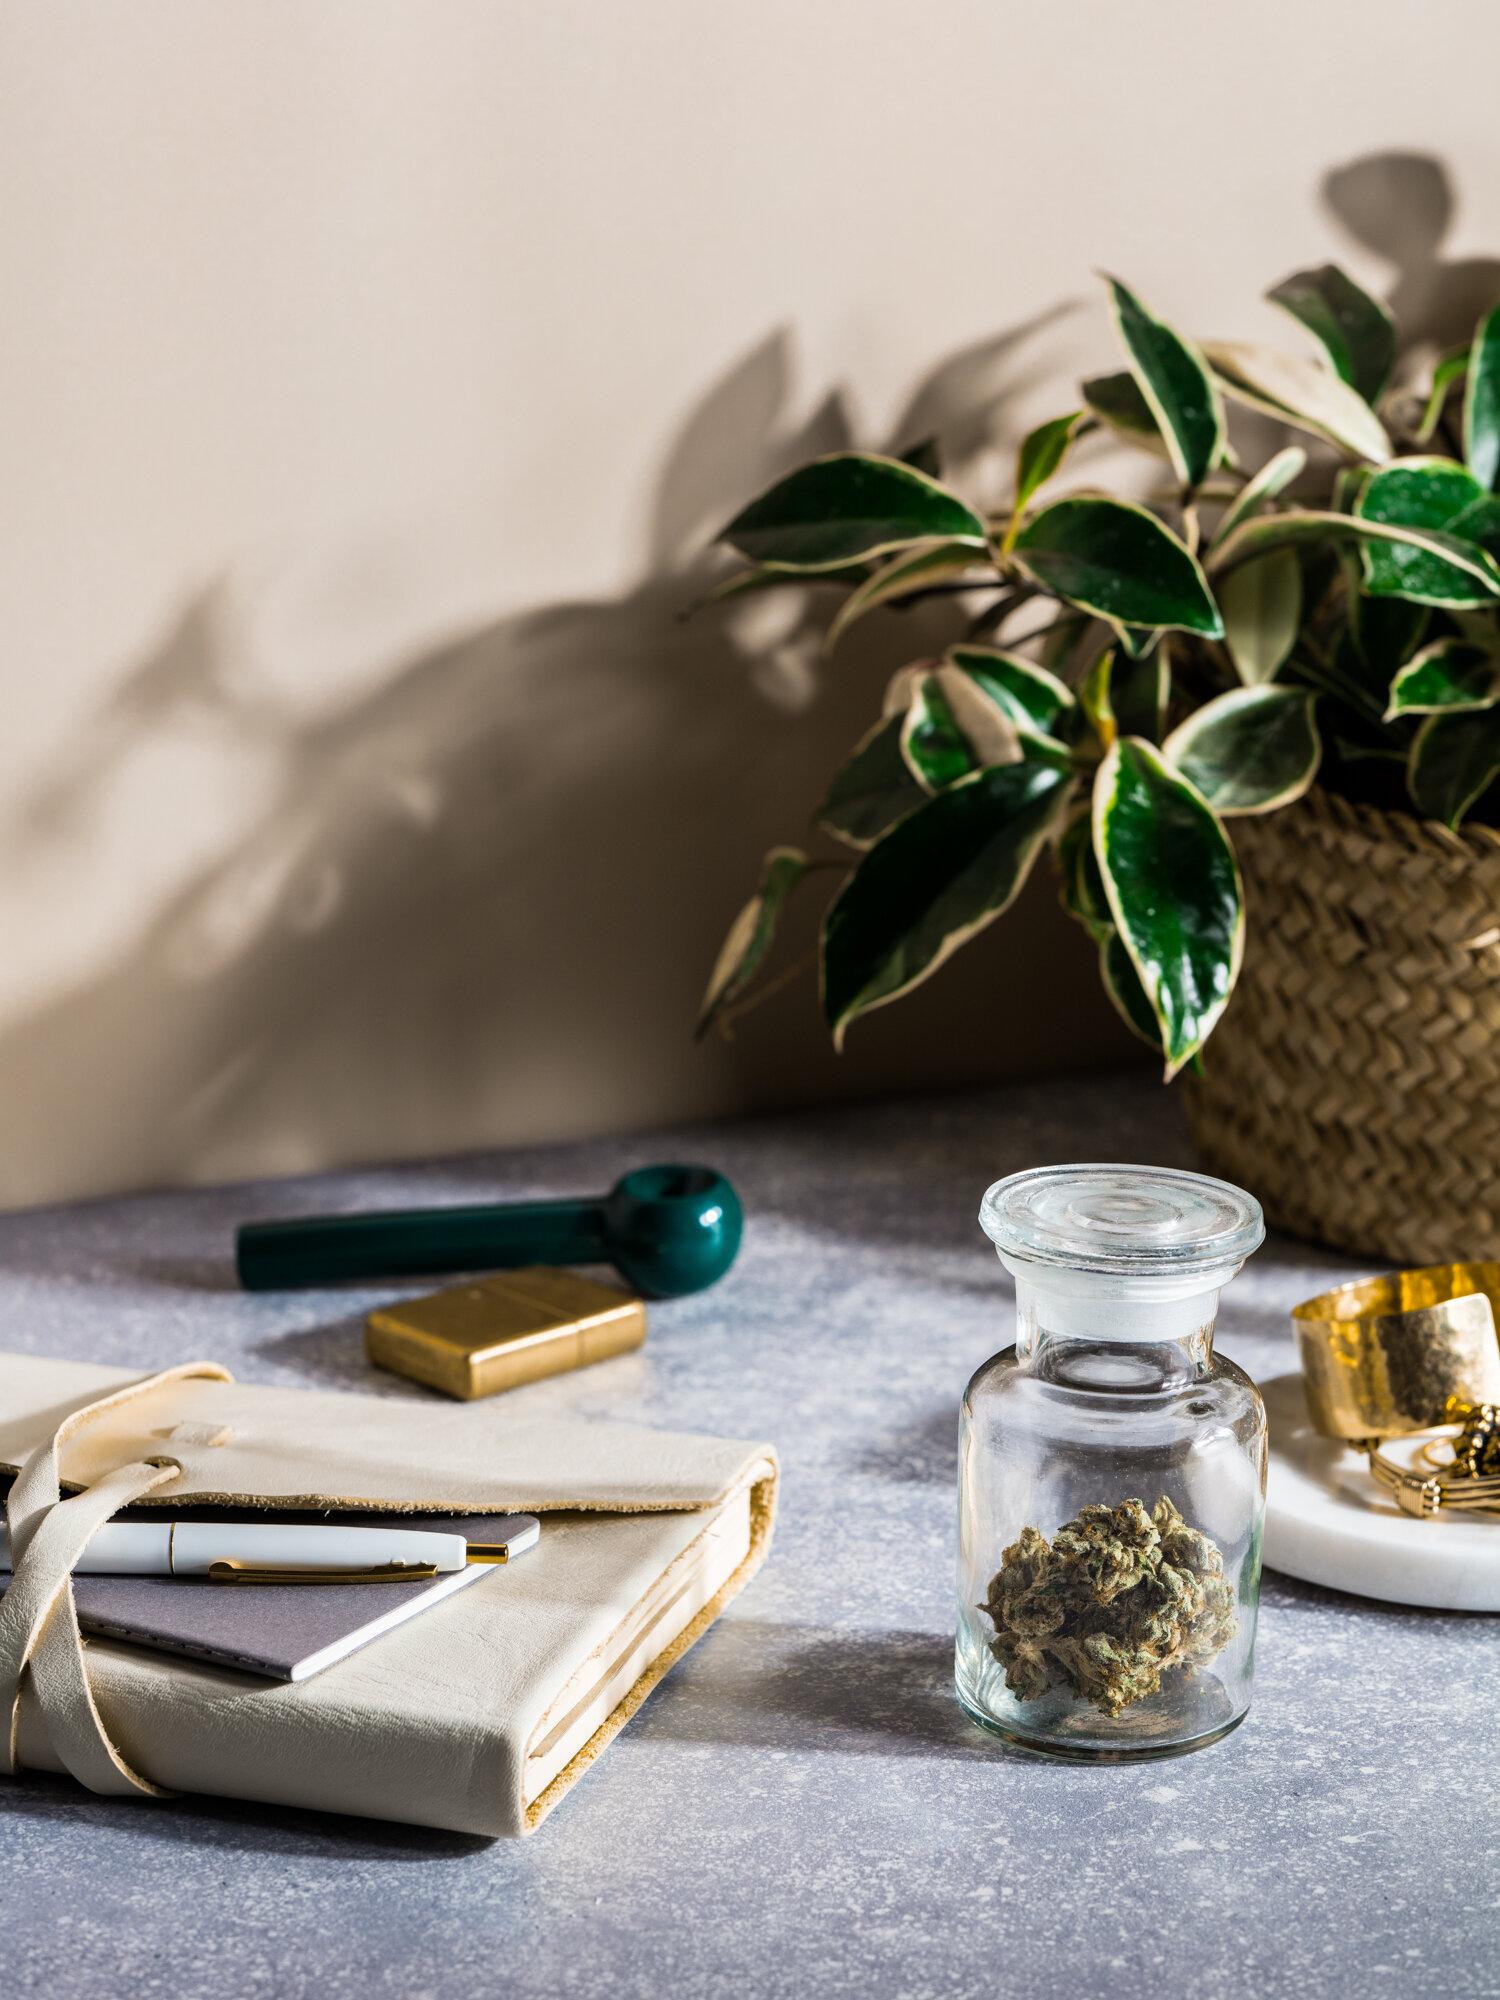 erin-scott-san-francisco-california-cannabis-photographer-ten-speed-press-editorial-9061.jpg